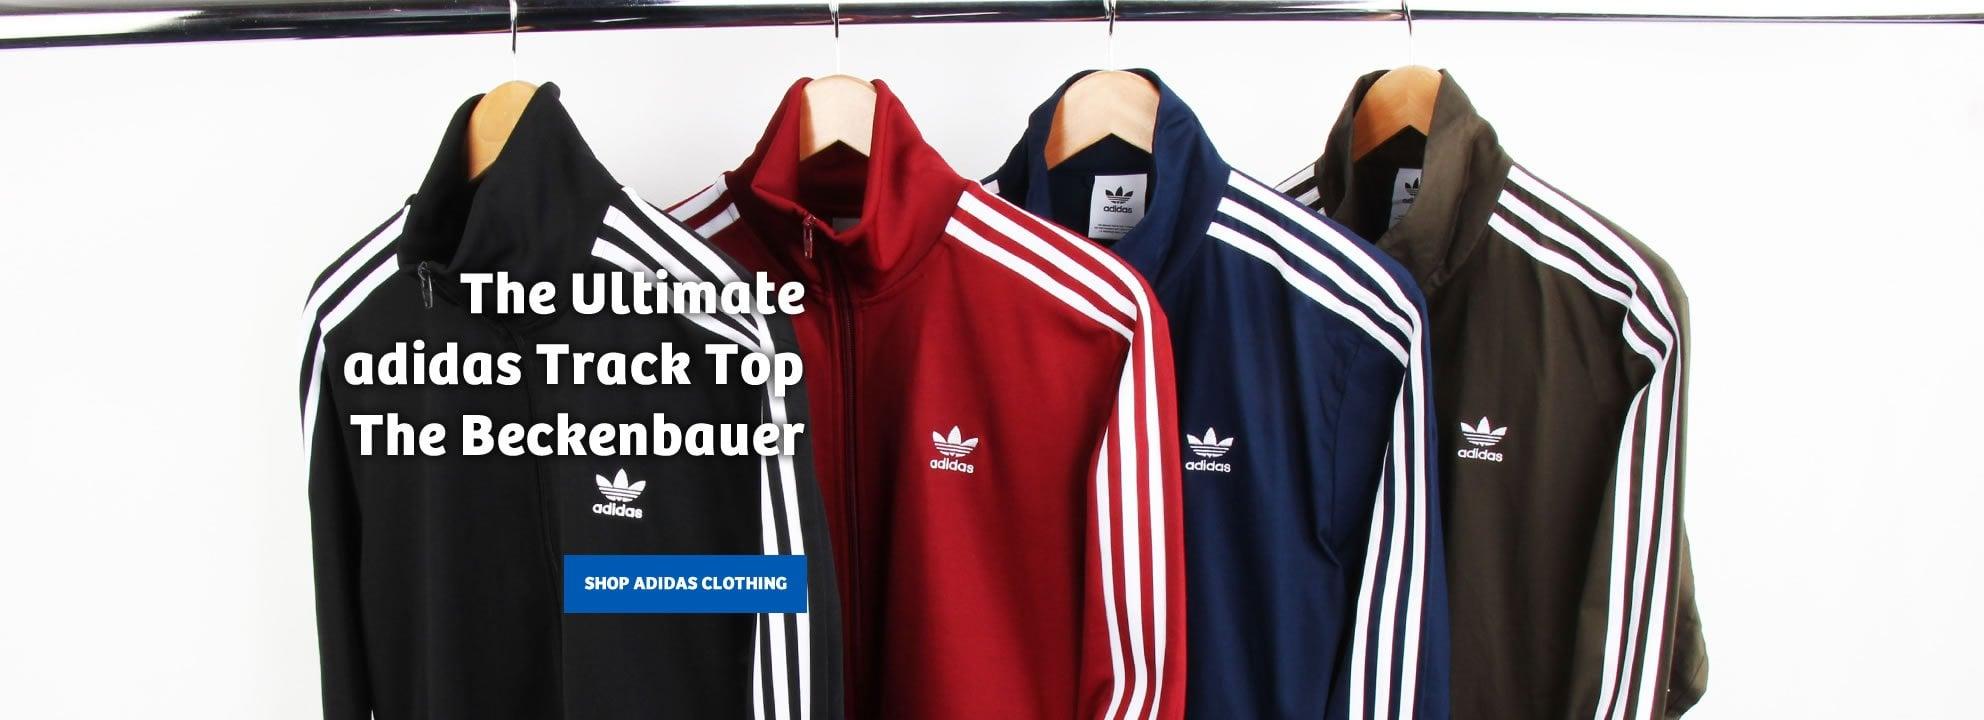 Adidas Beckenbauer Track Tops